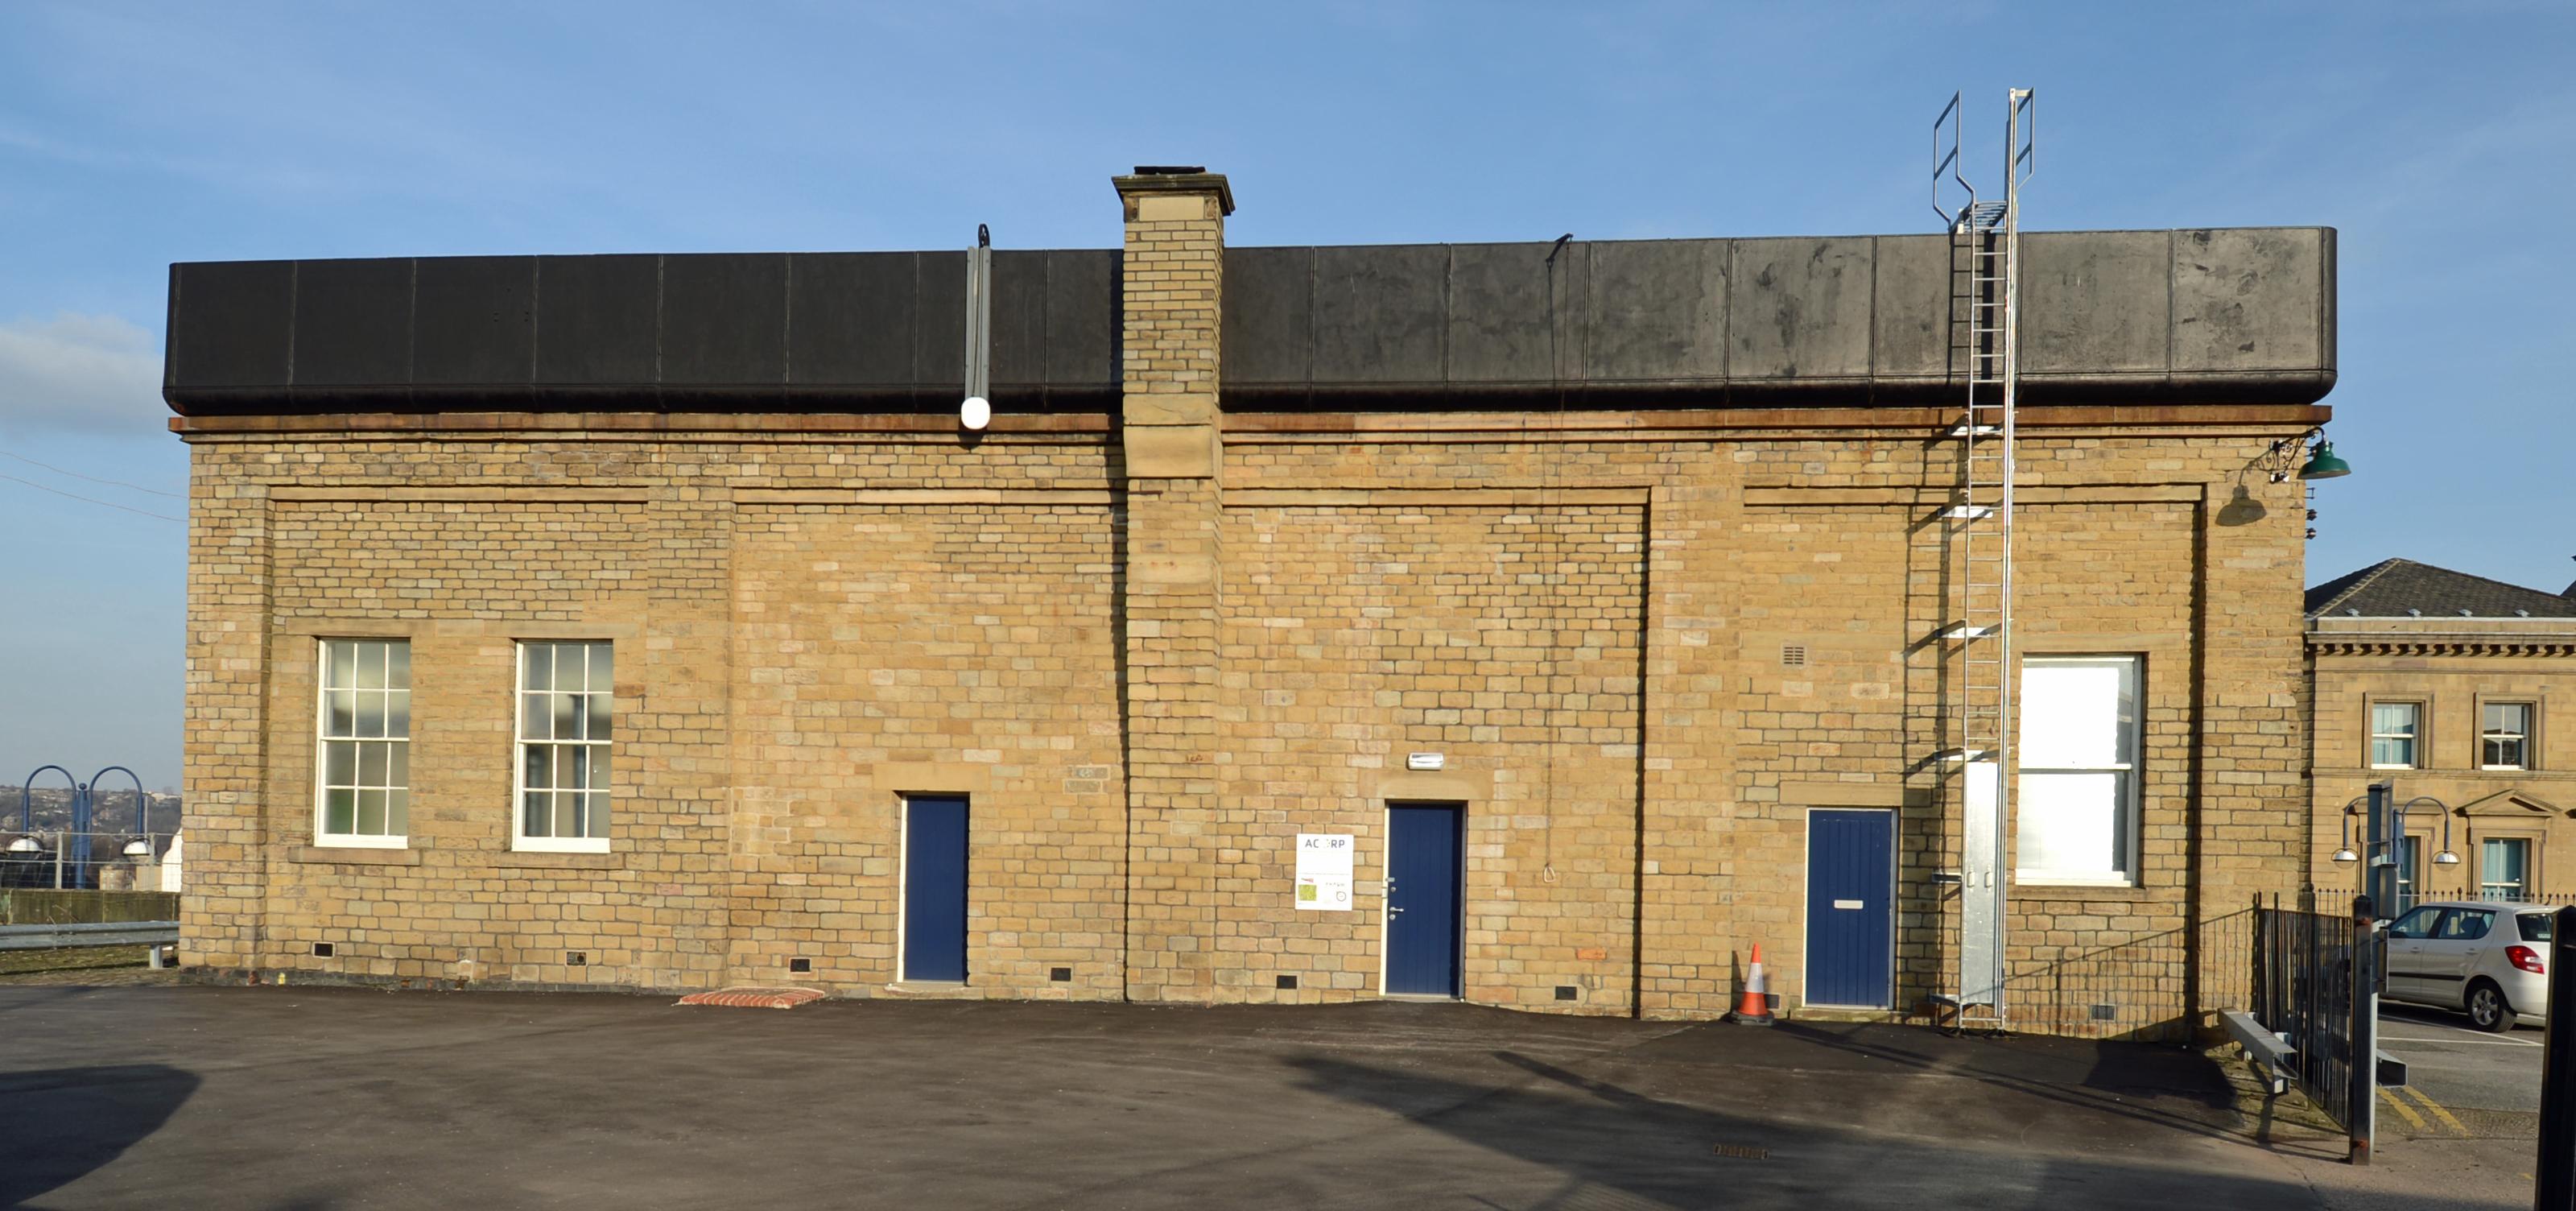 DG138747. ACoRP Office. Huddersfield. 17.2.13.